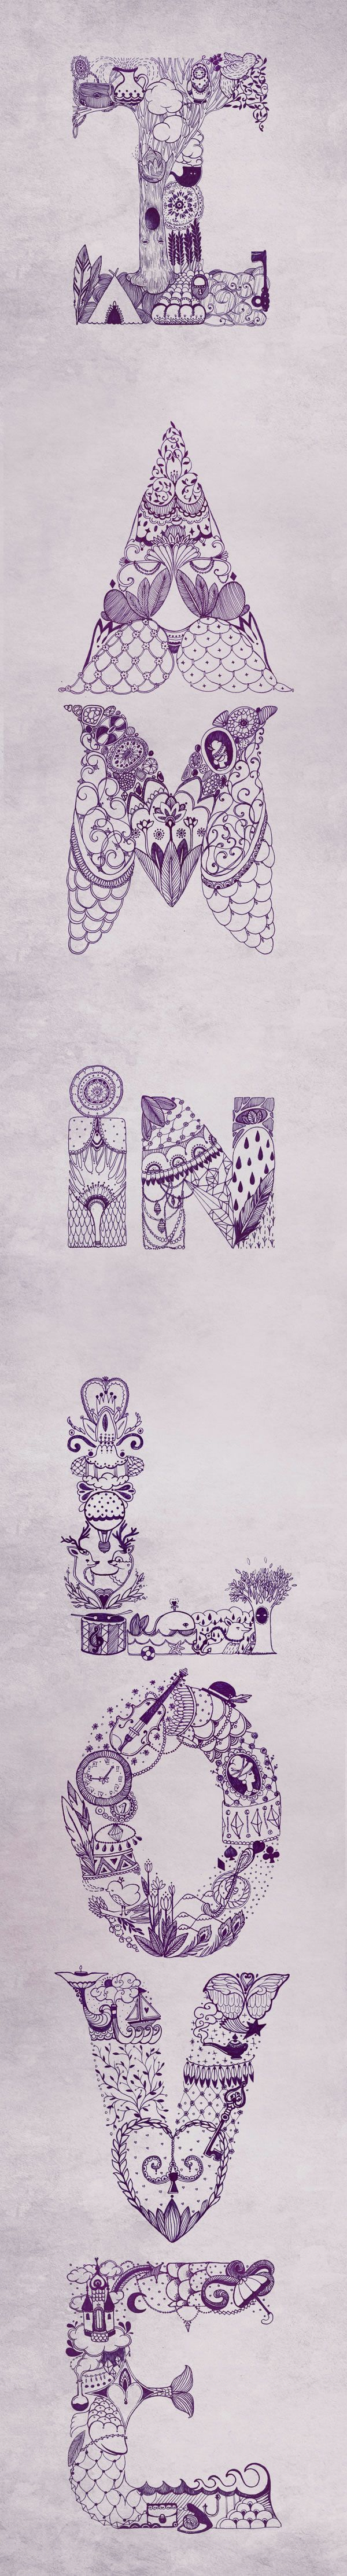 Super Cool Typography Work by Eika Dopludo